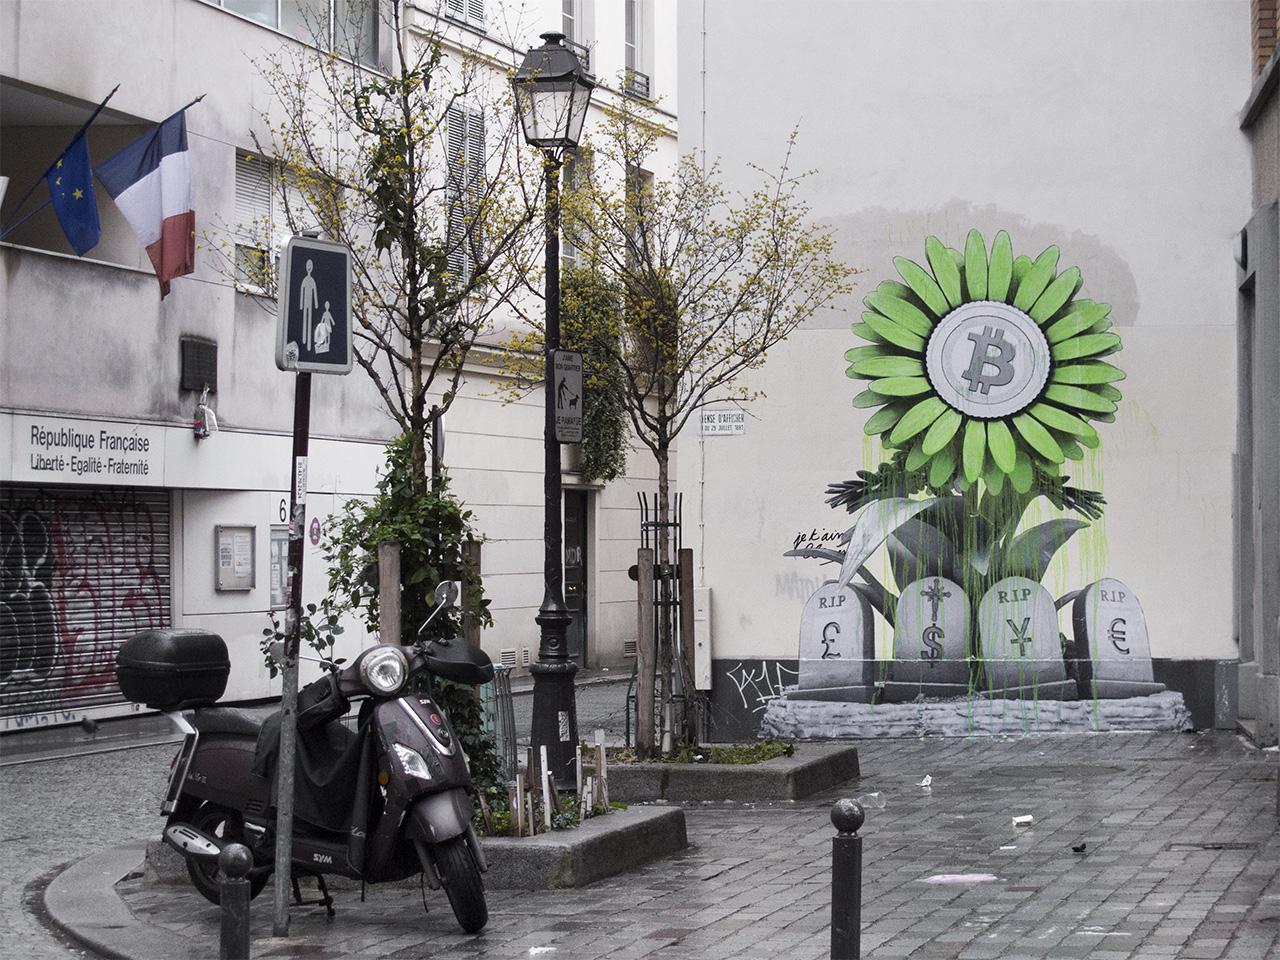 """R.I.P Banking System"" by Ludo in Paris Artes & contextos IMG 4614 copy"